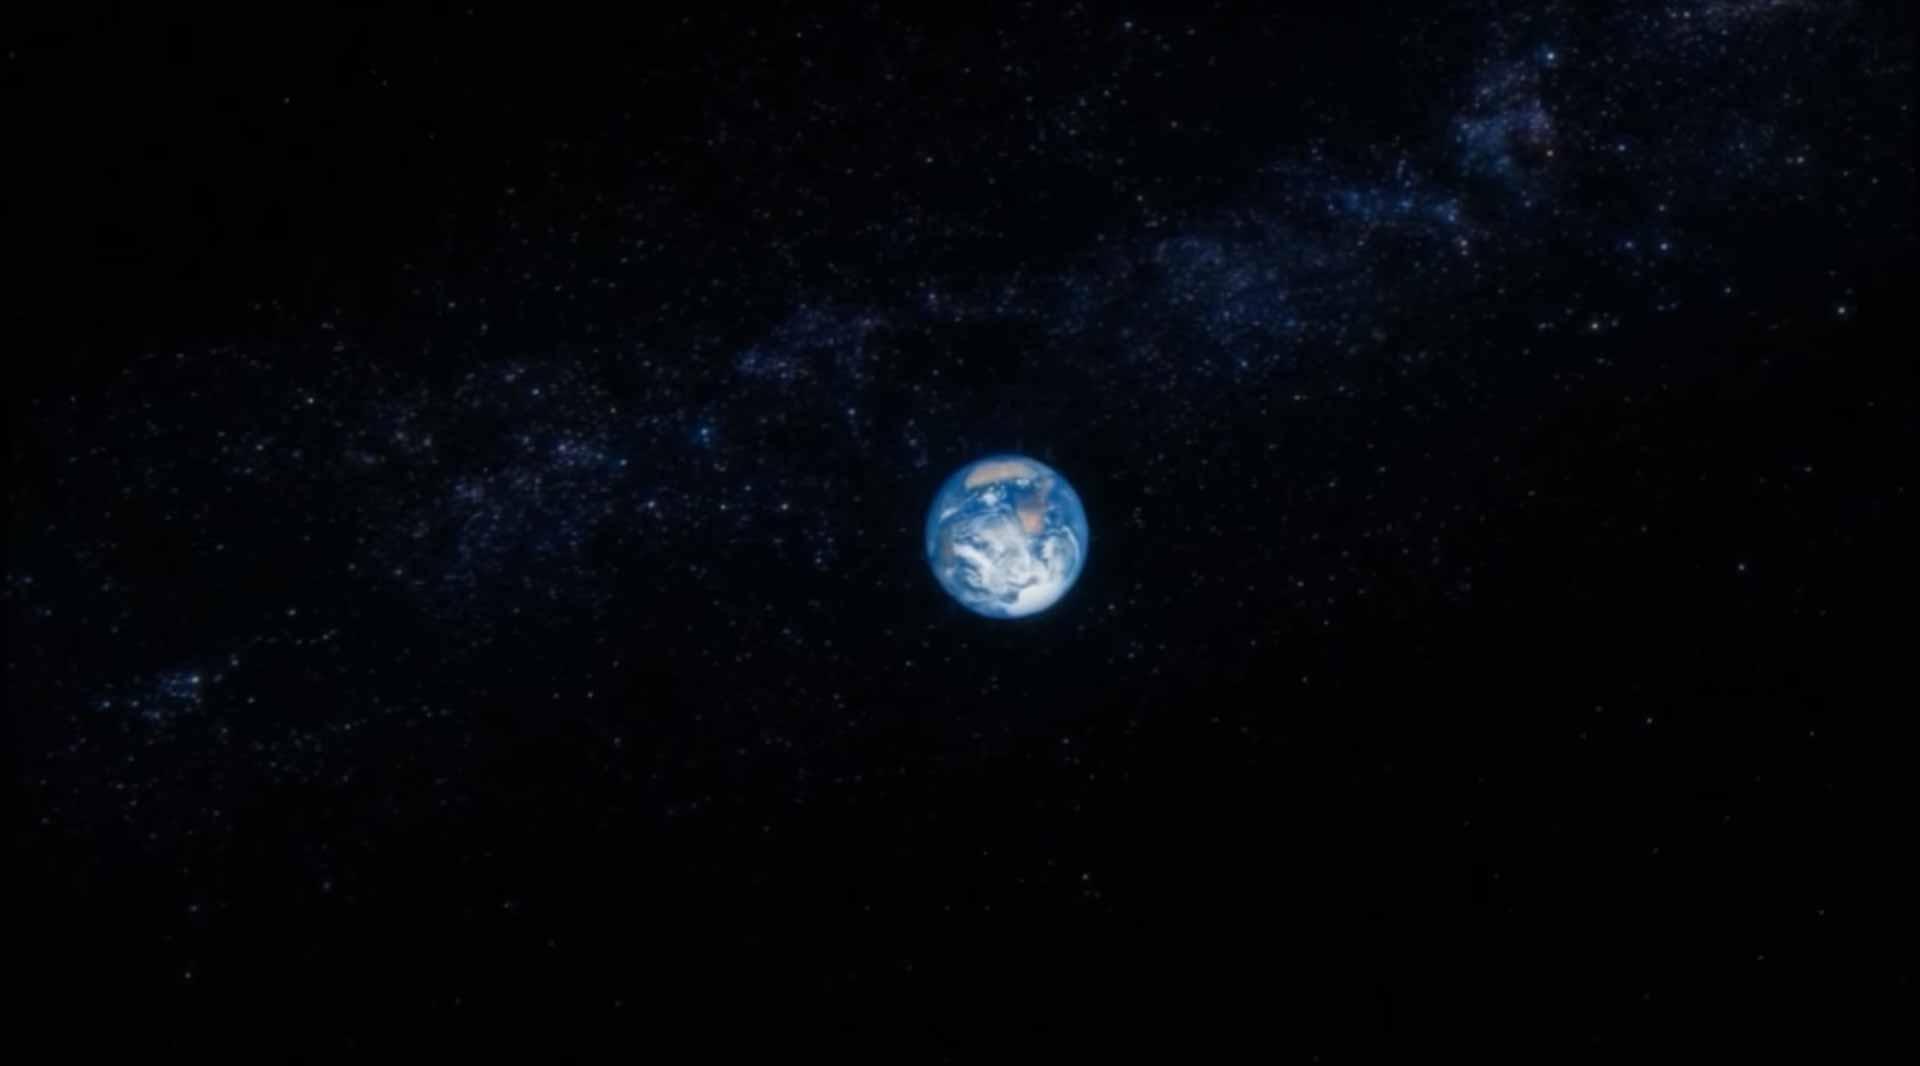 Carl Sagan Pale Blue Dot Hd With Subtitles